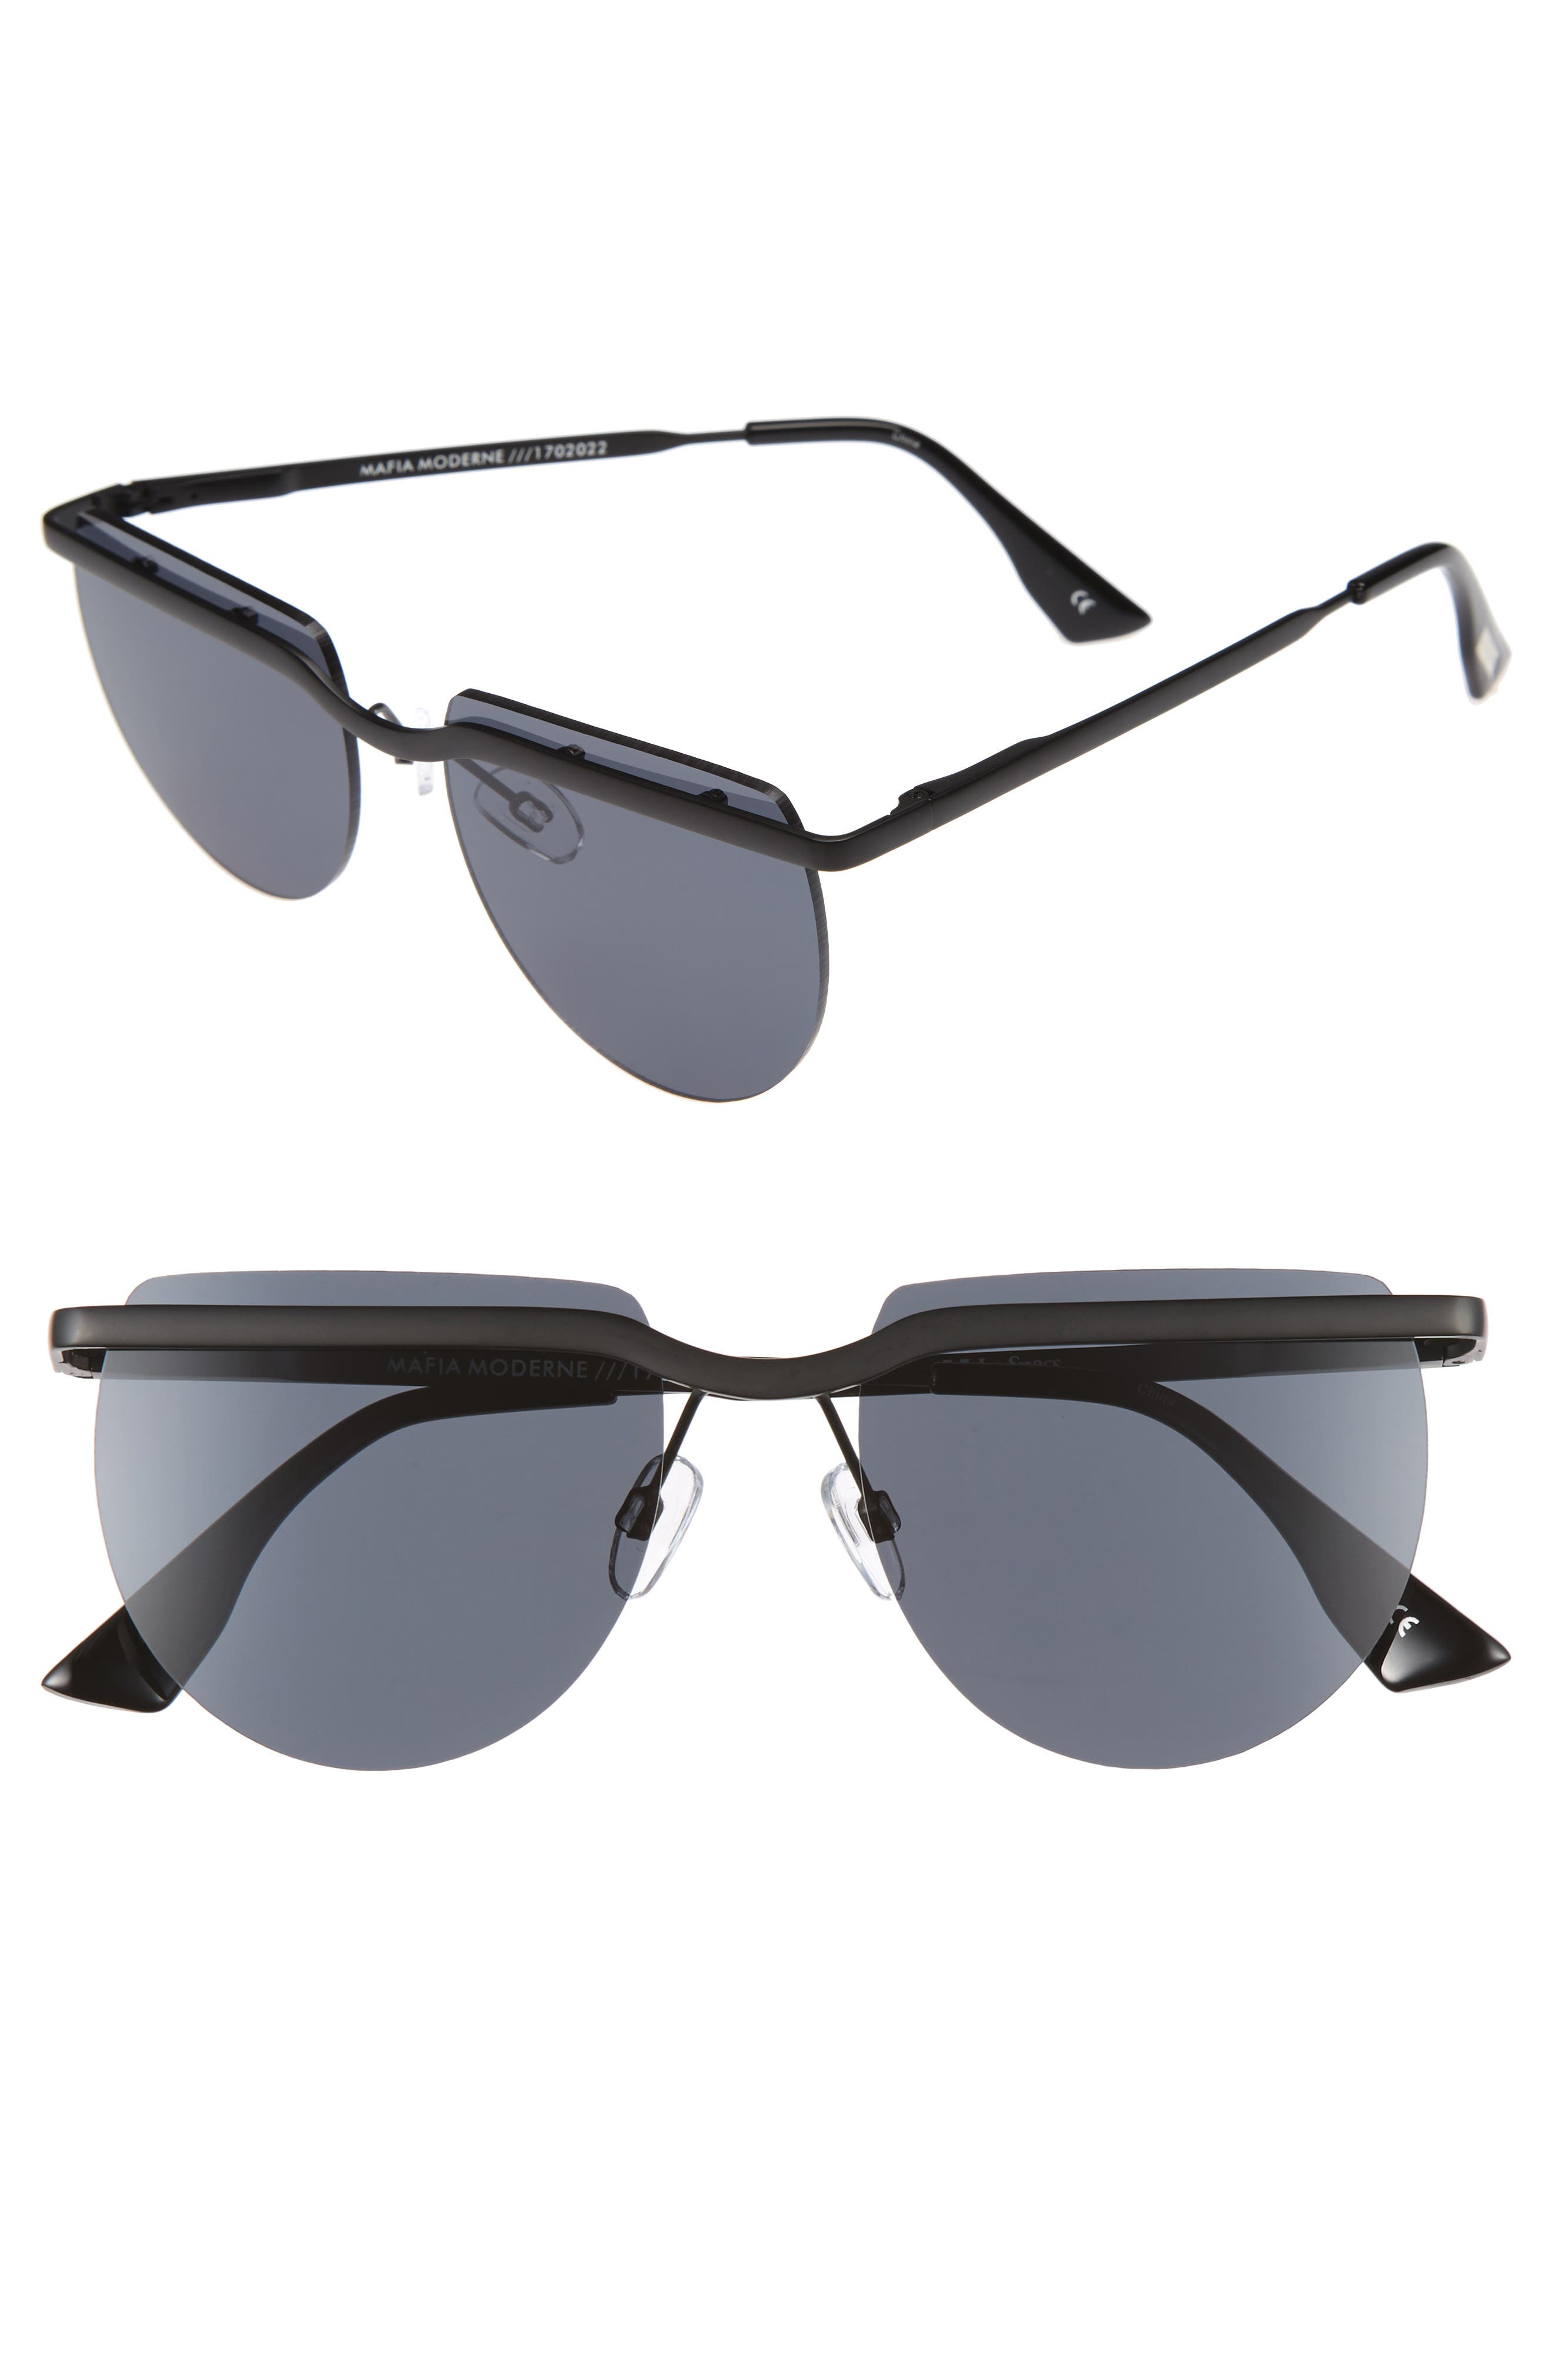 Alternate Image 1 Selected - Le Specs Mafia Moderne 52mm Rimless Sunglasses